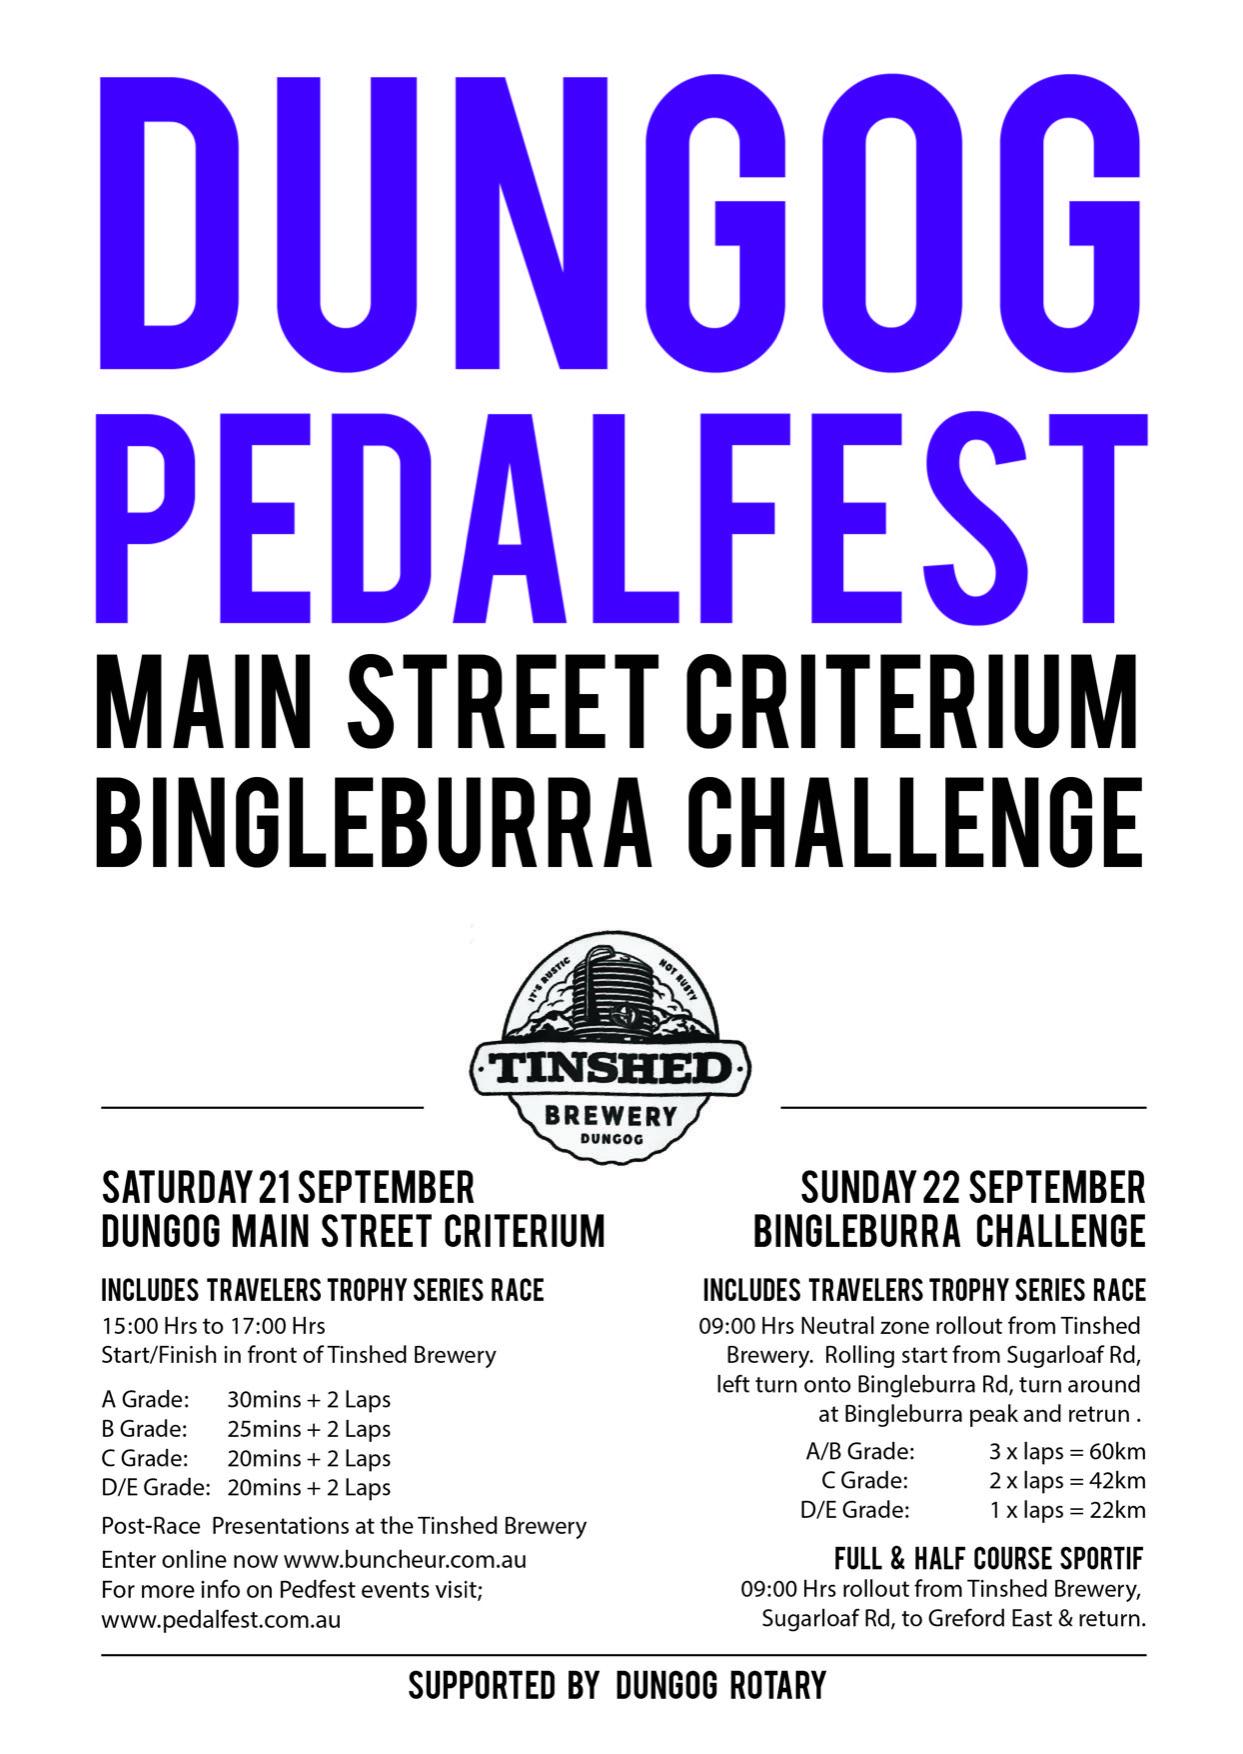 Dungog 19 - Race Formats.JPG